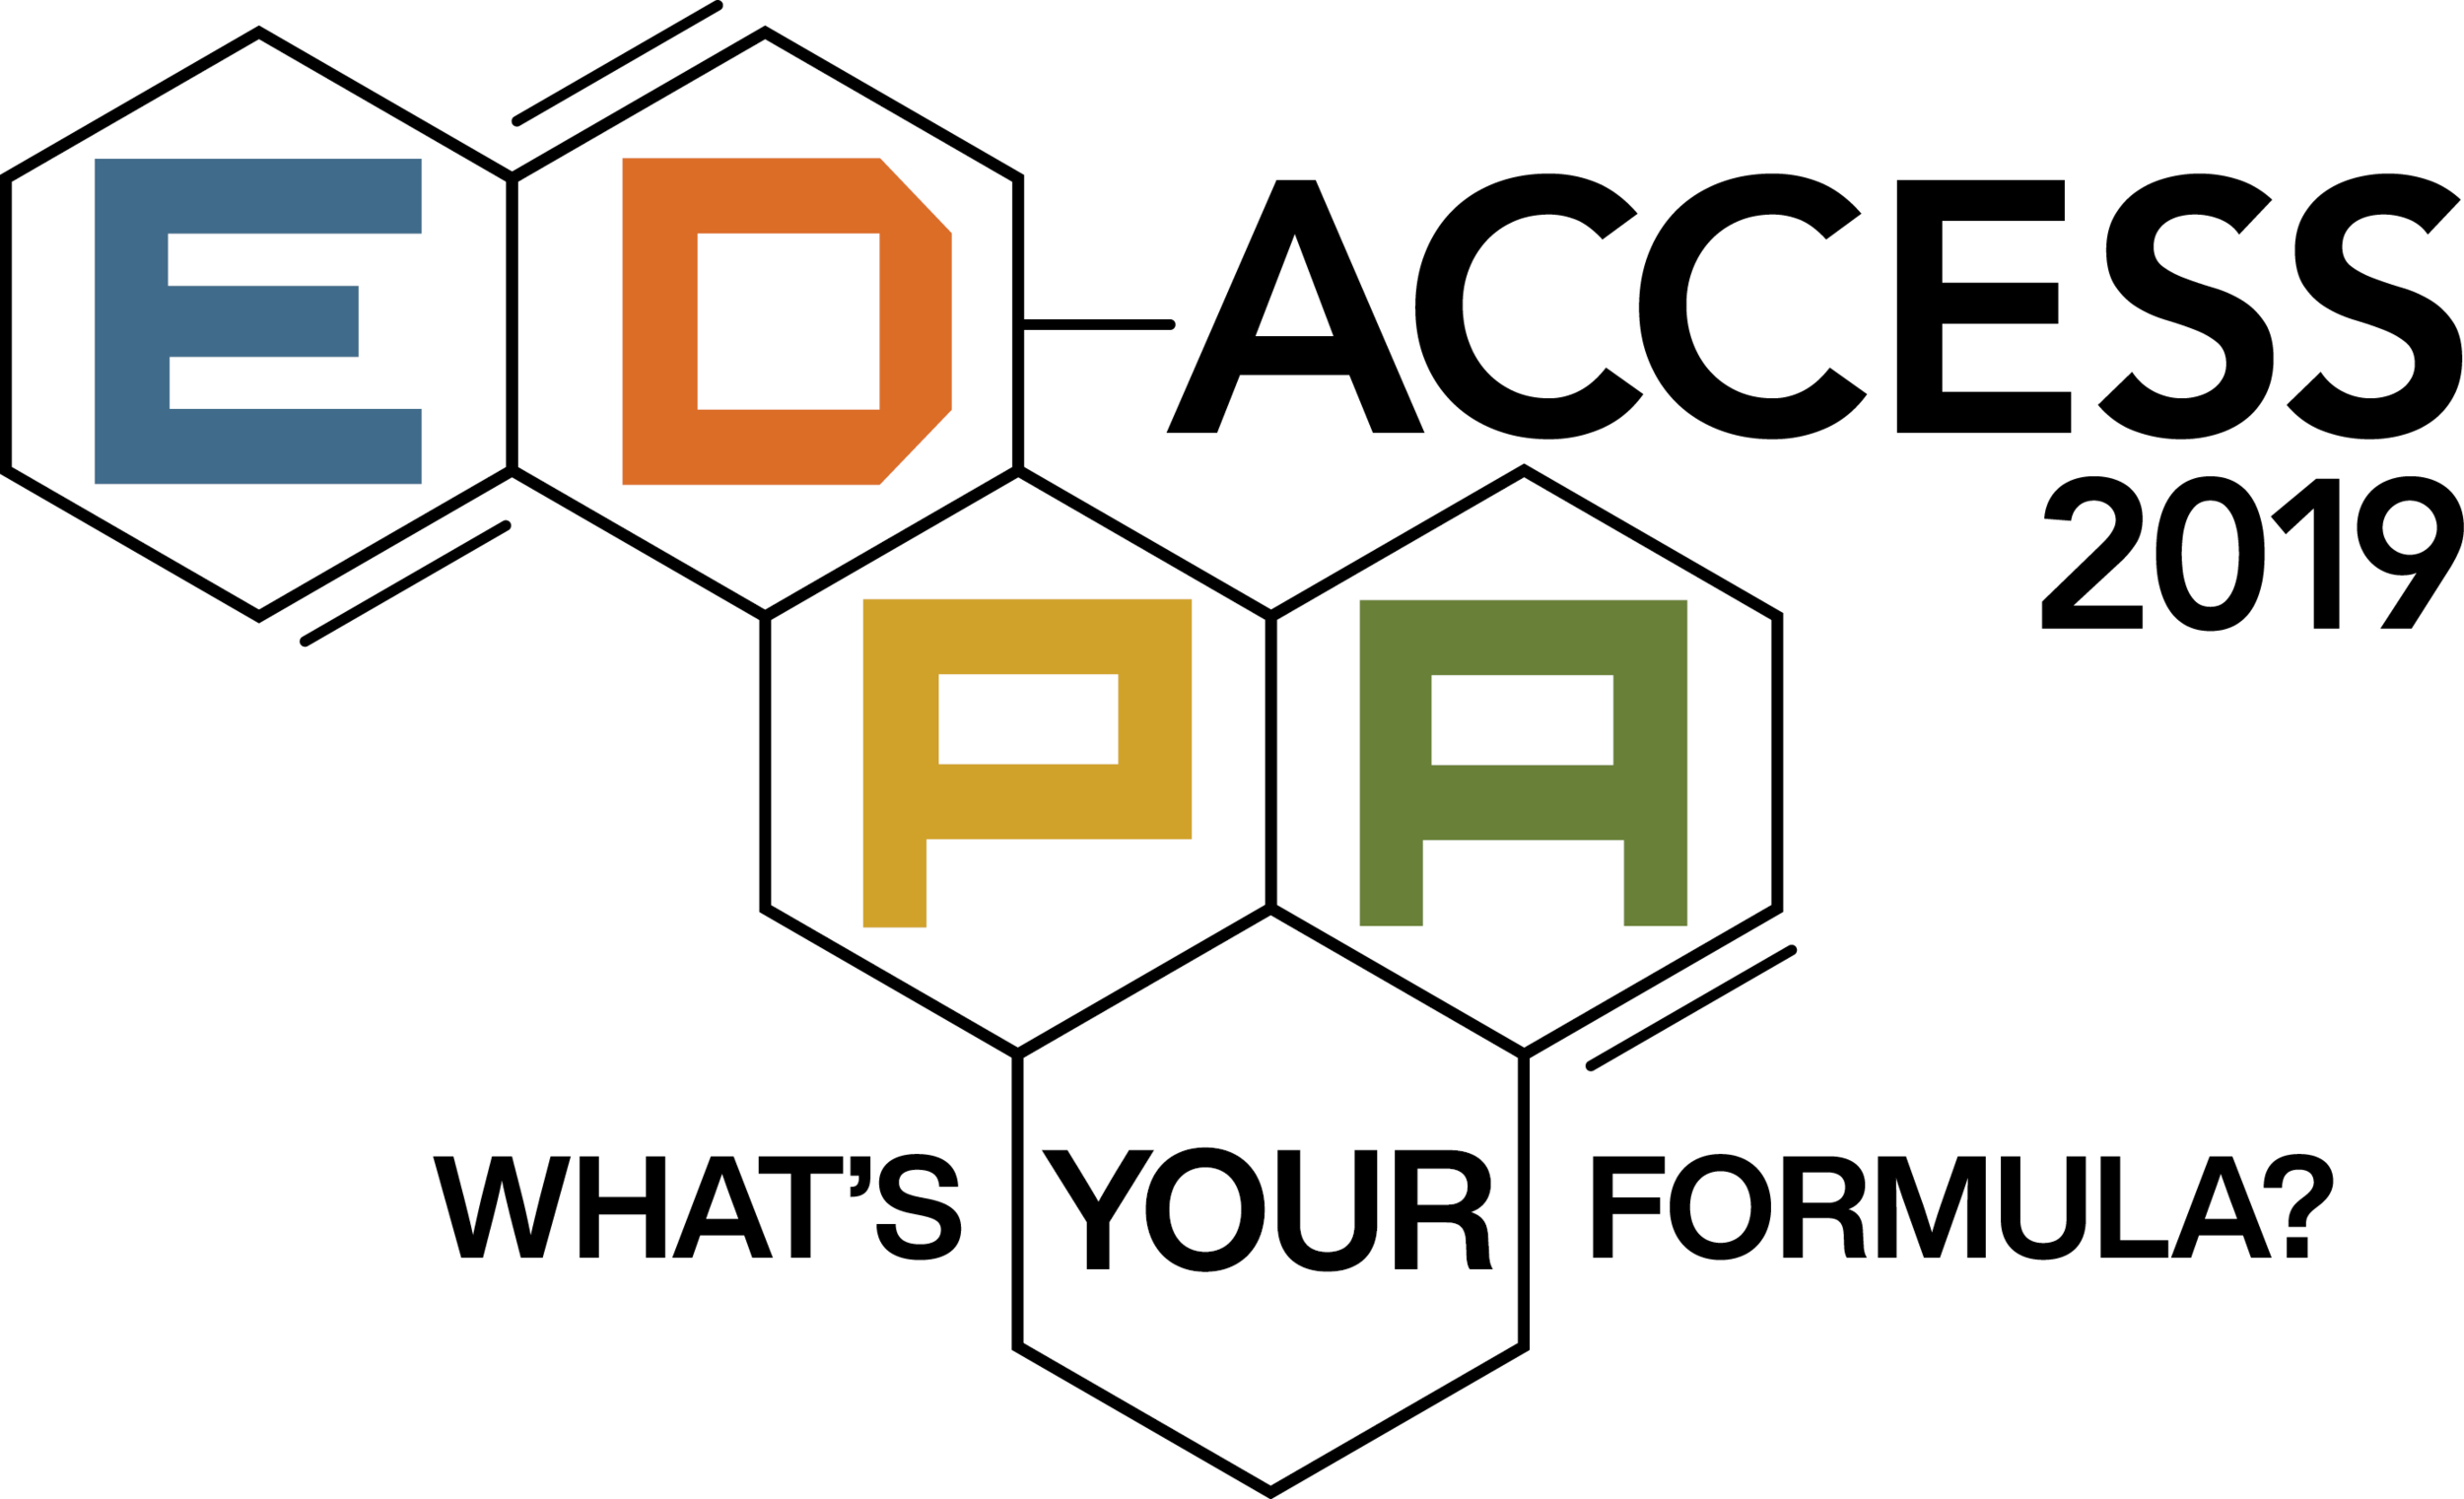 EDPA_Access2019_Logo_Subtitle_HiRes.png